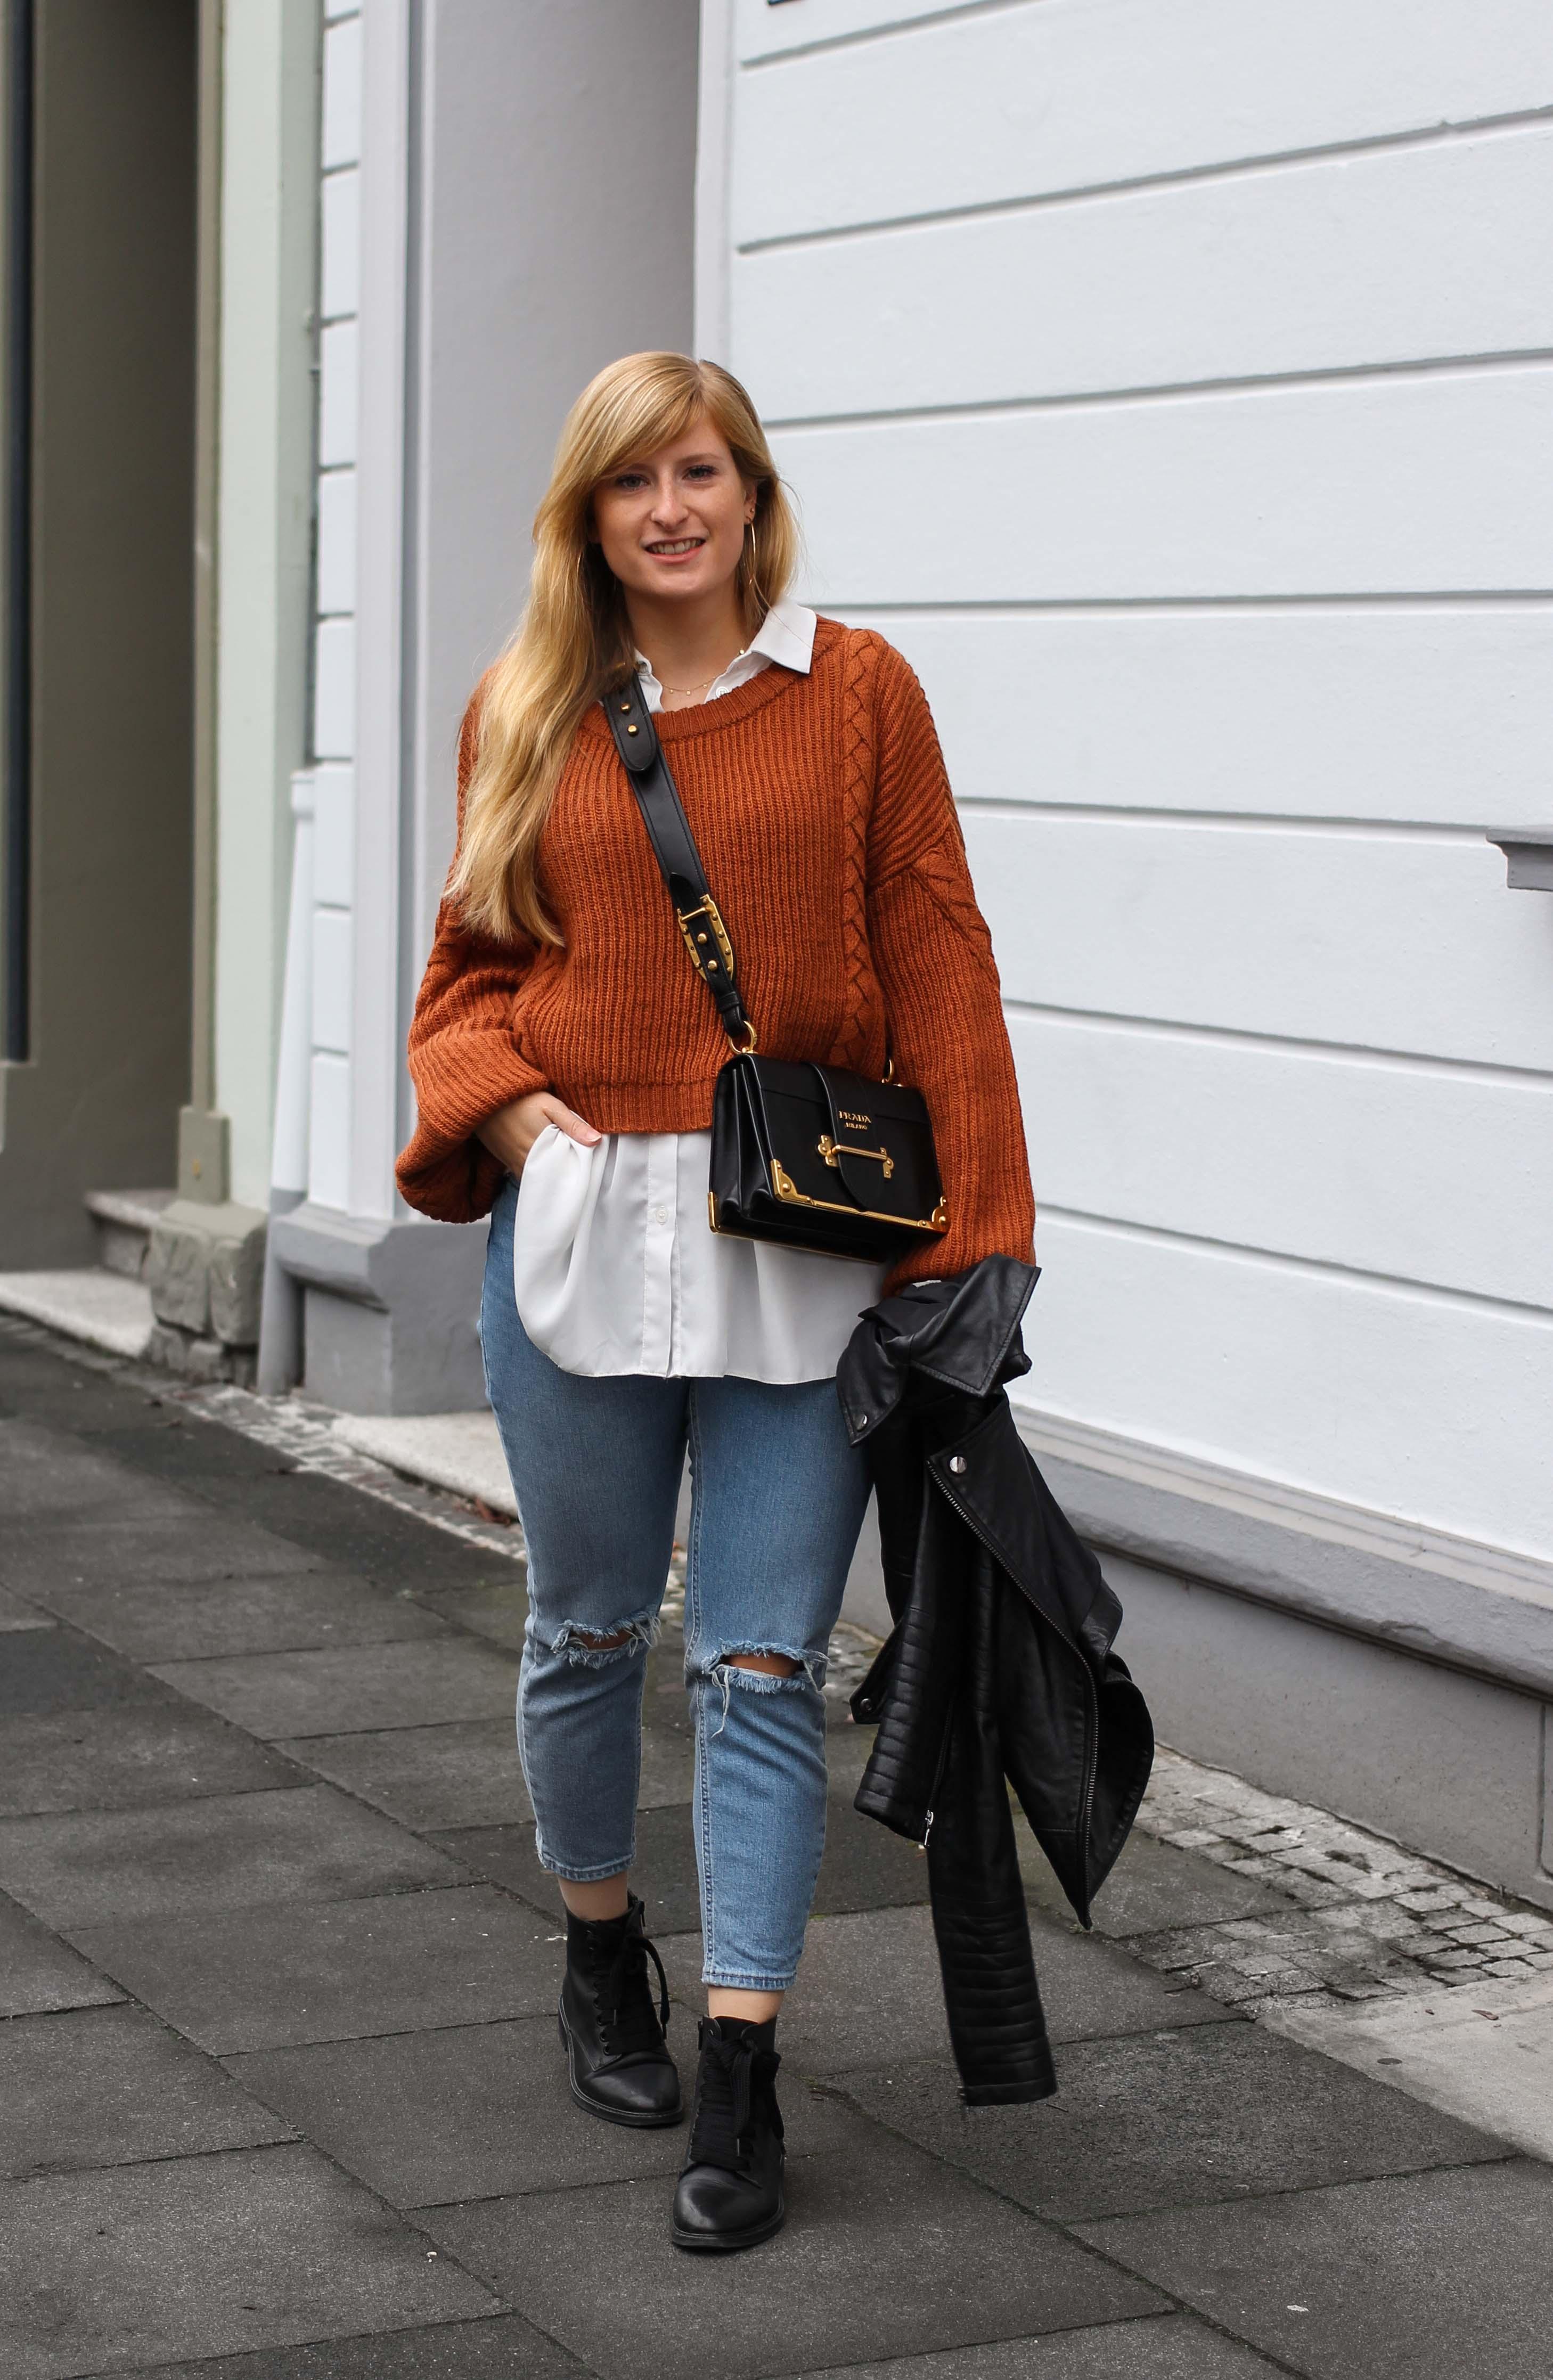 Übergangslook Crop Wollpullover Layering Bluse kombinieren zerrissene Jeans Modeblog Outfit Streetstyle Köln Prada Handtasche 92